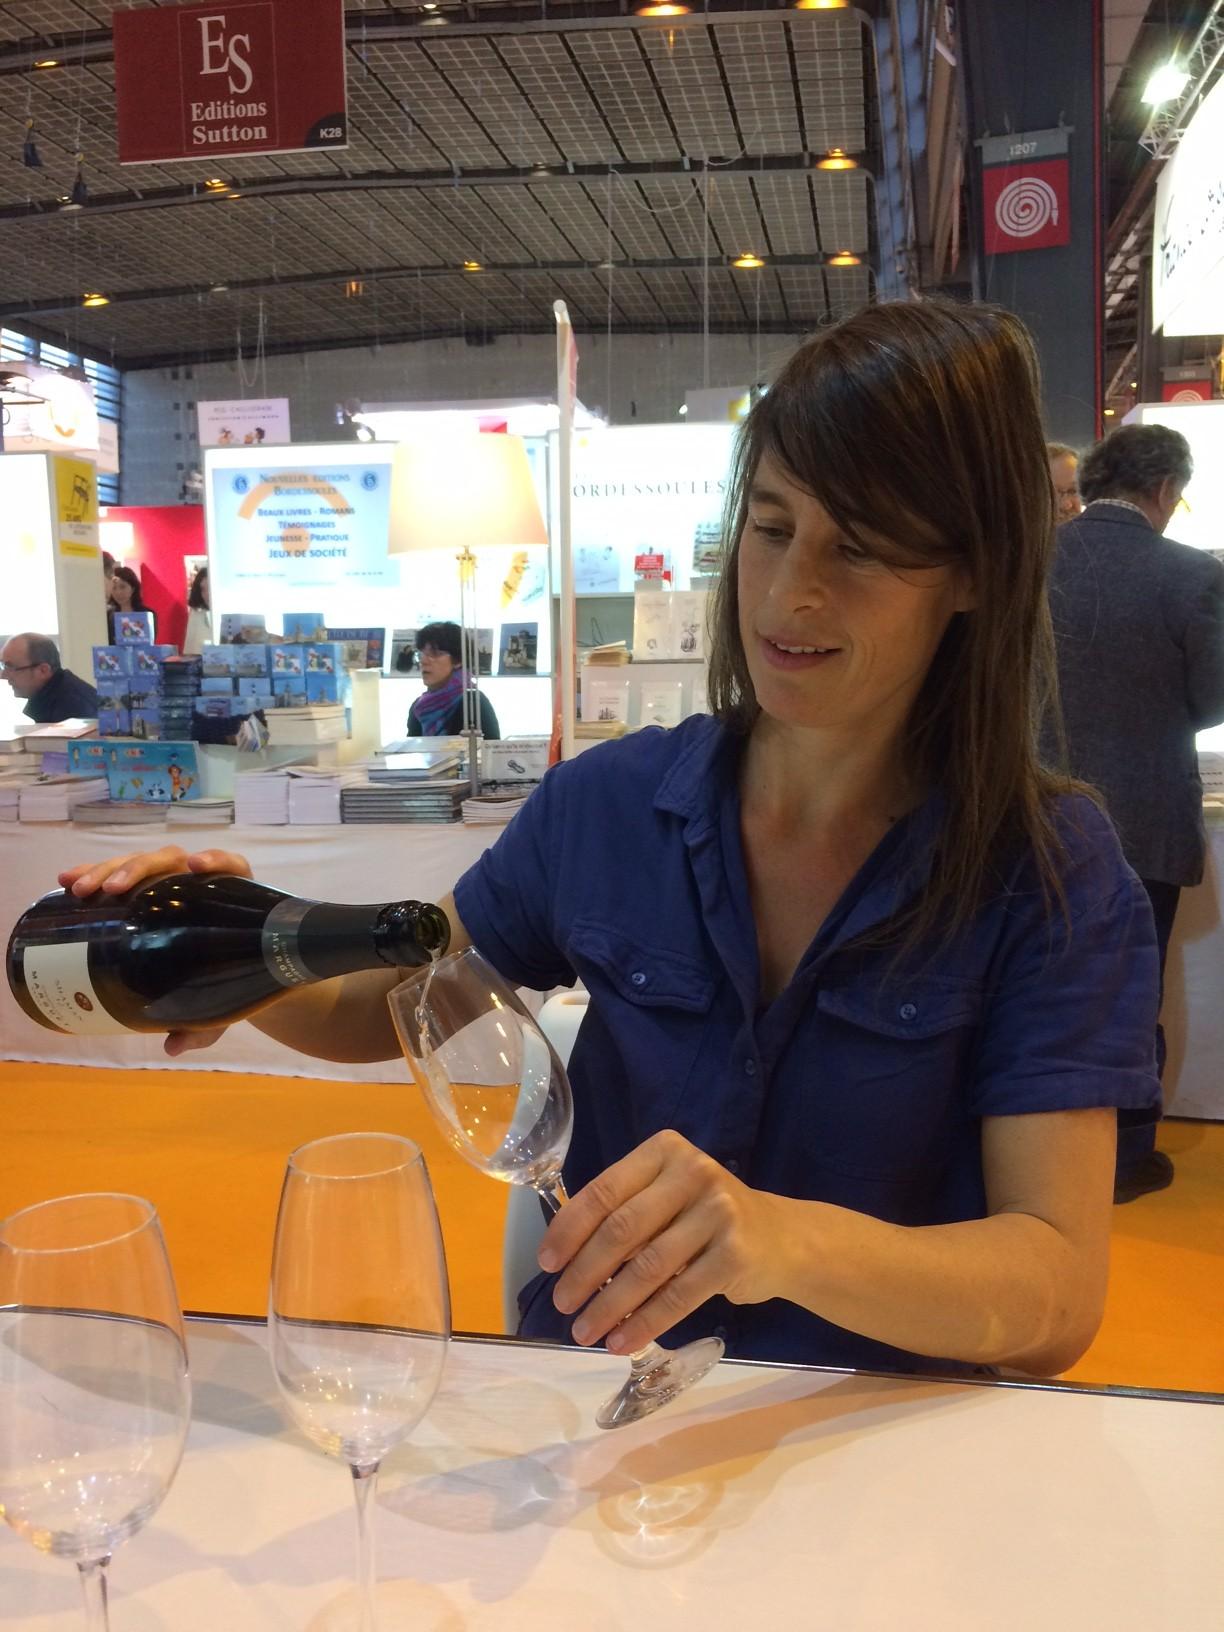 Marie Berne-Champagne